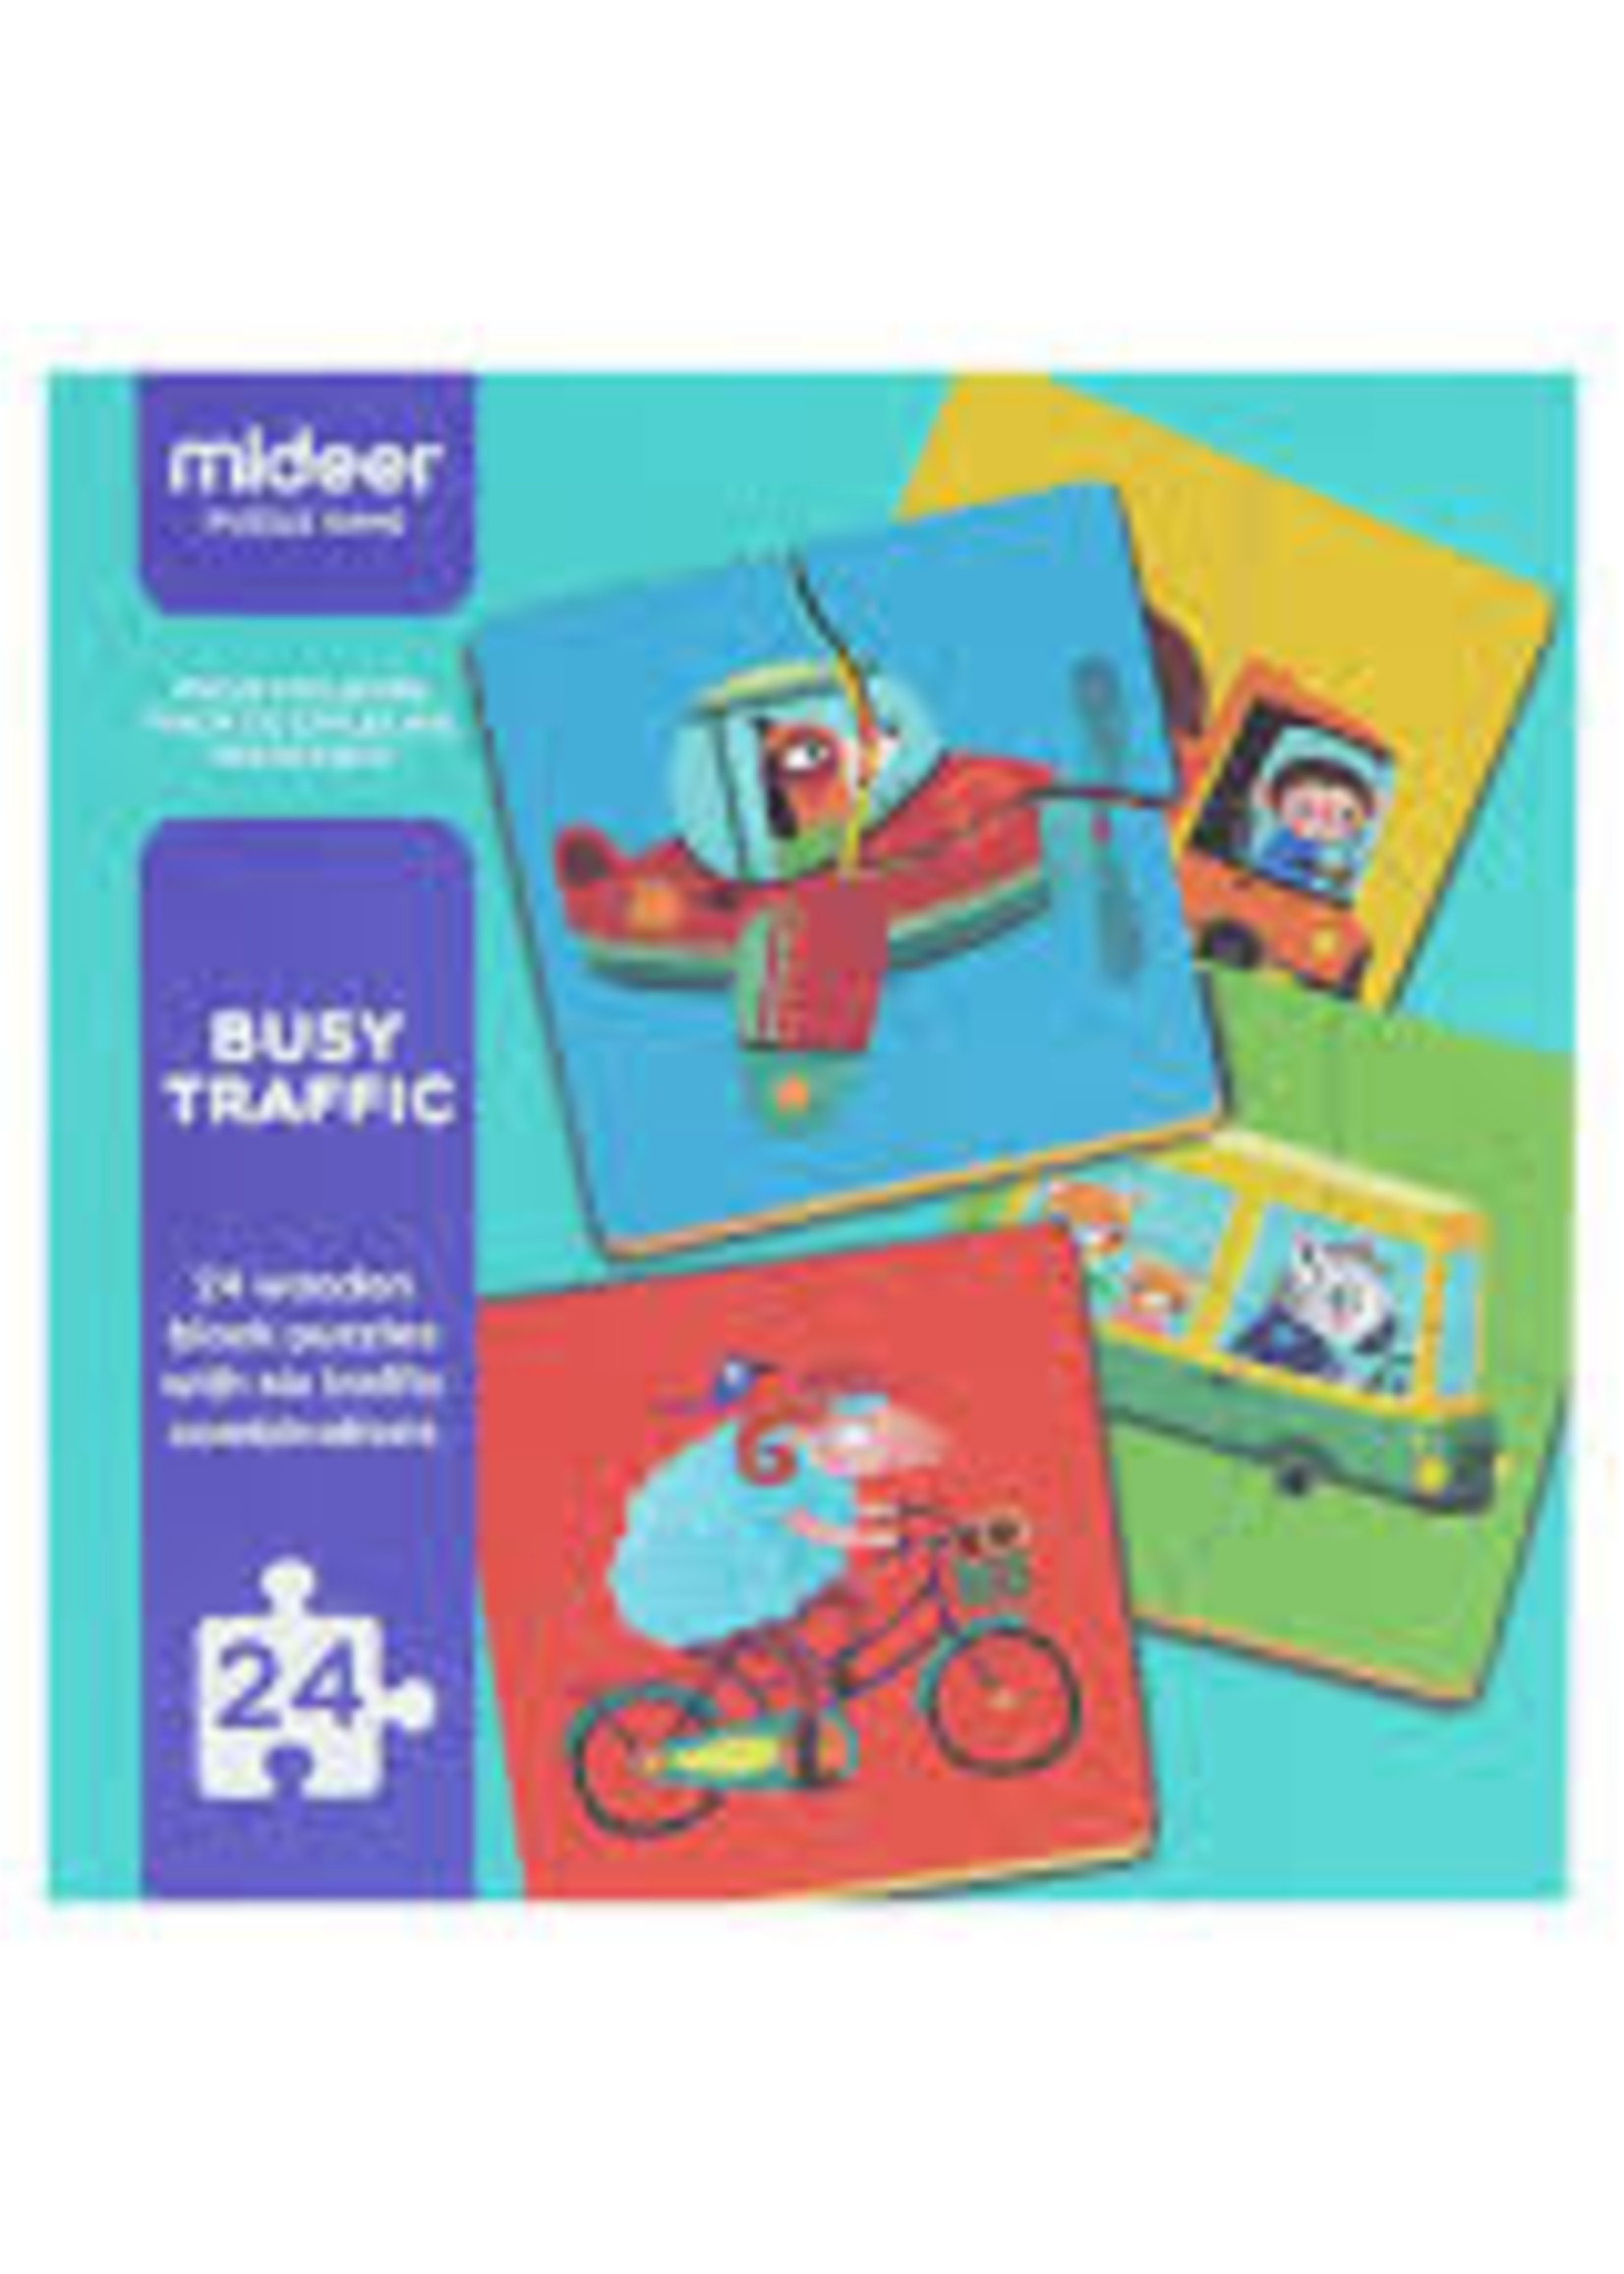 Mideer Mideer-AW20 MD3037 Busy Traffic 24 pcs